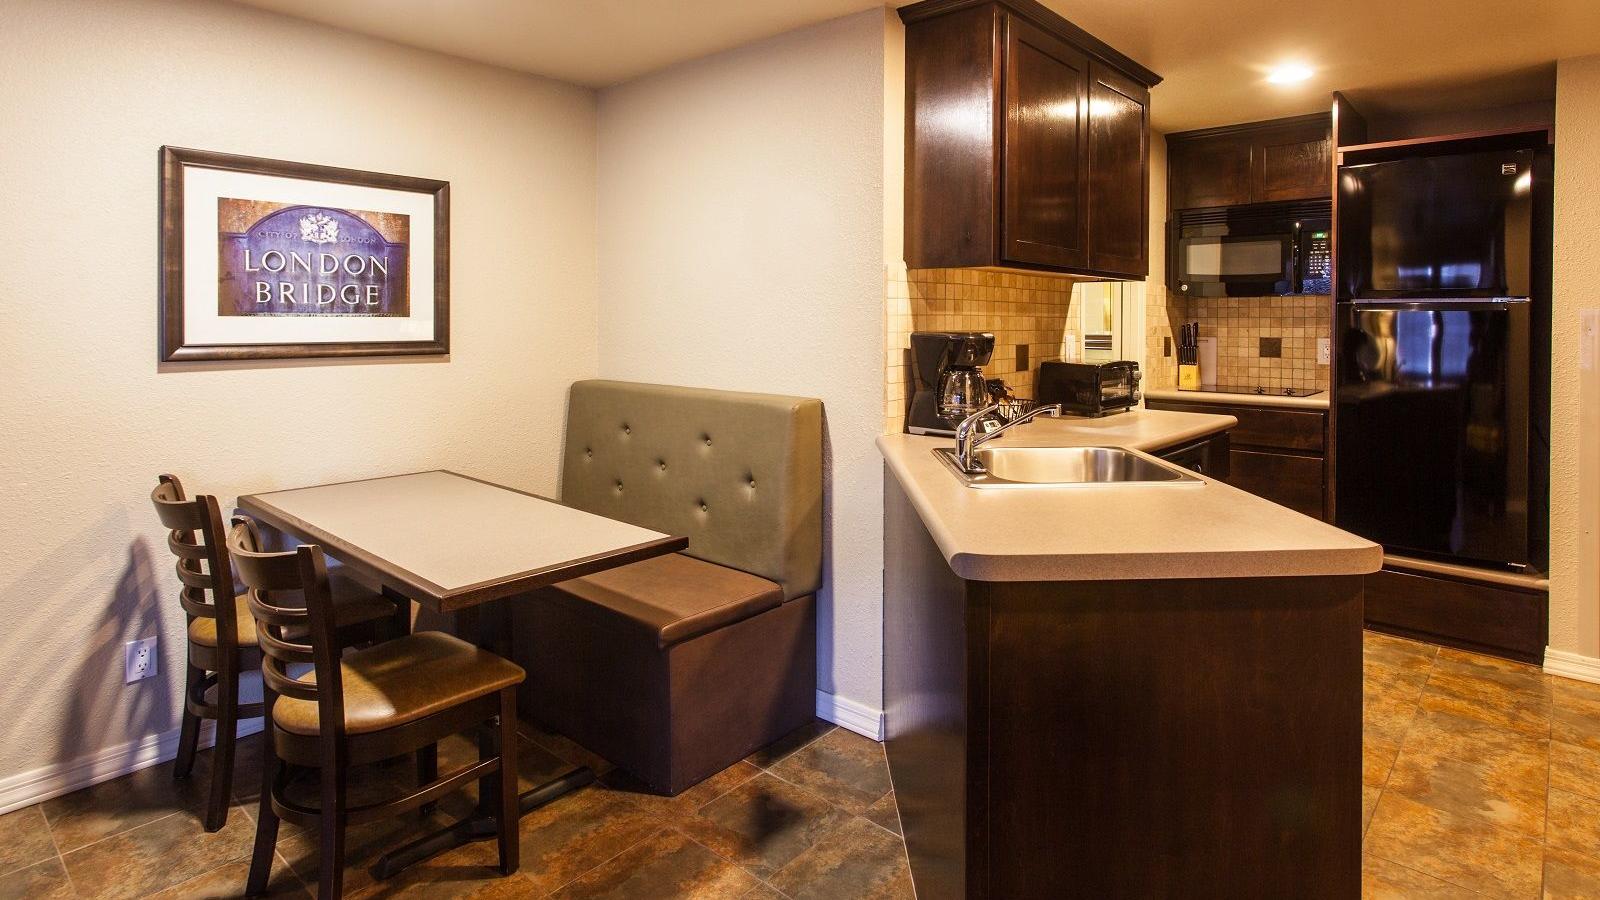 Kitchenette in resort suite.